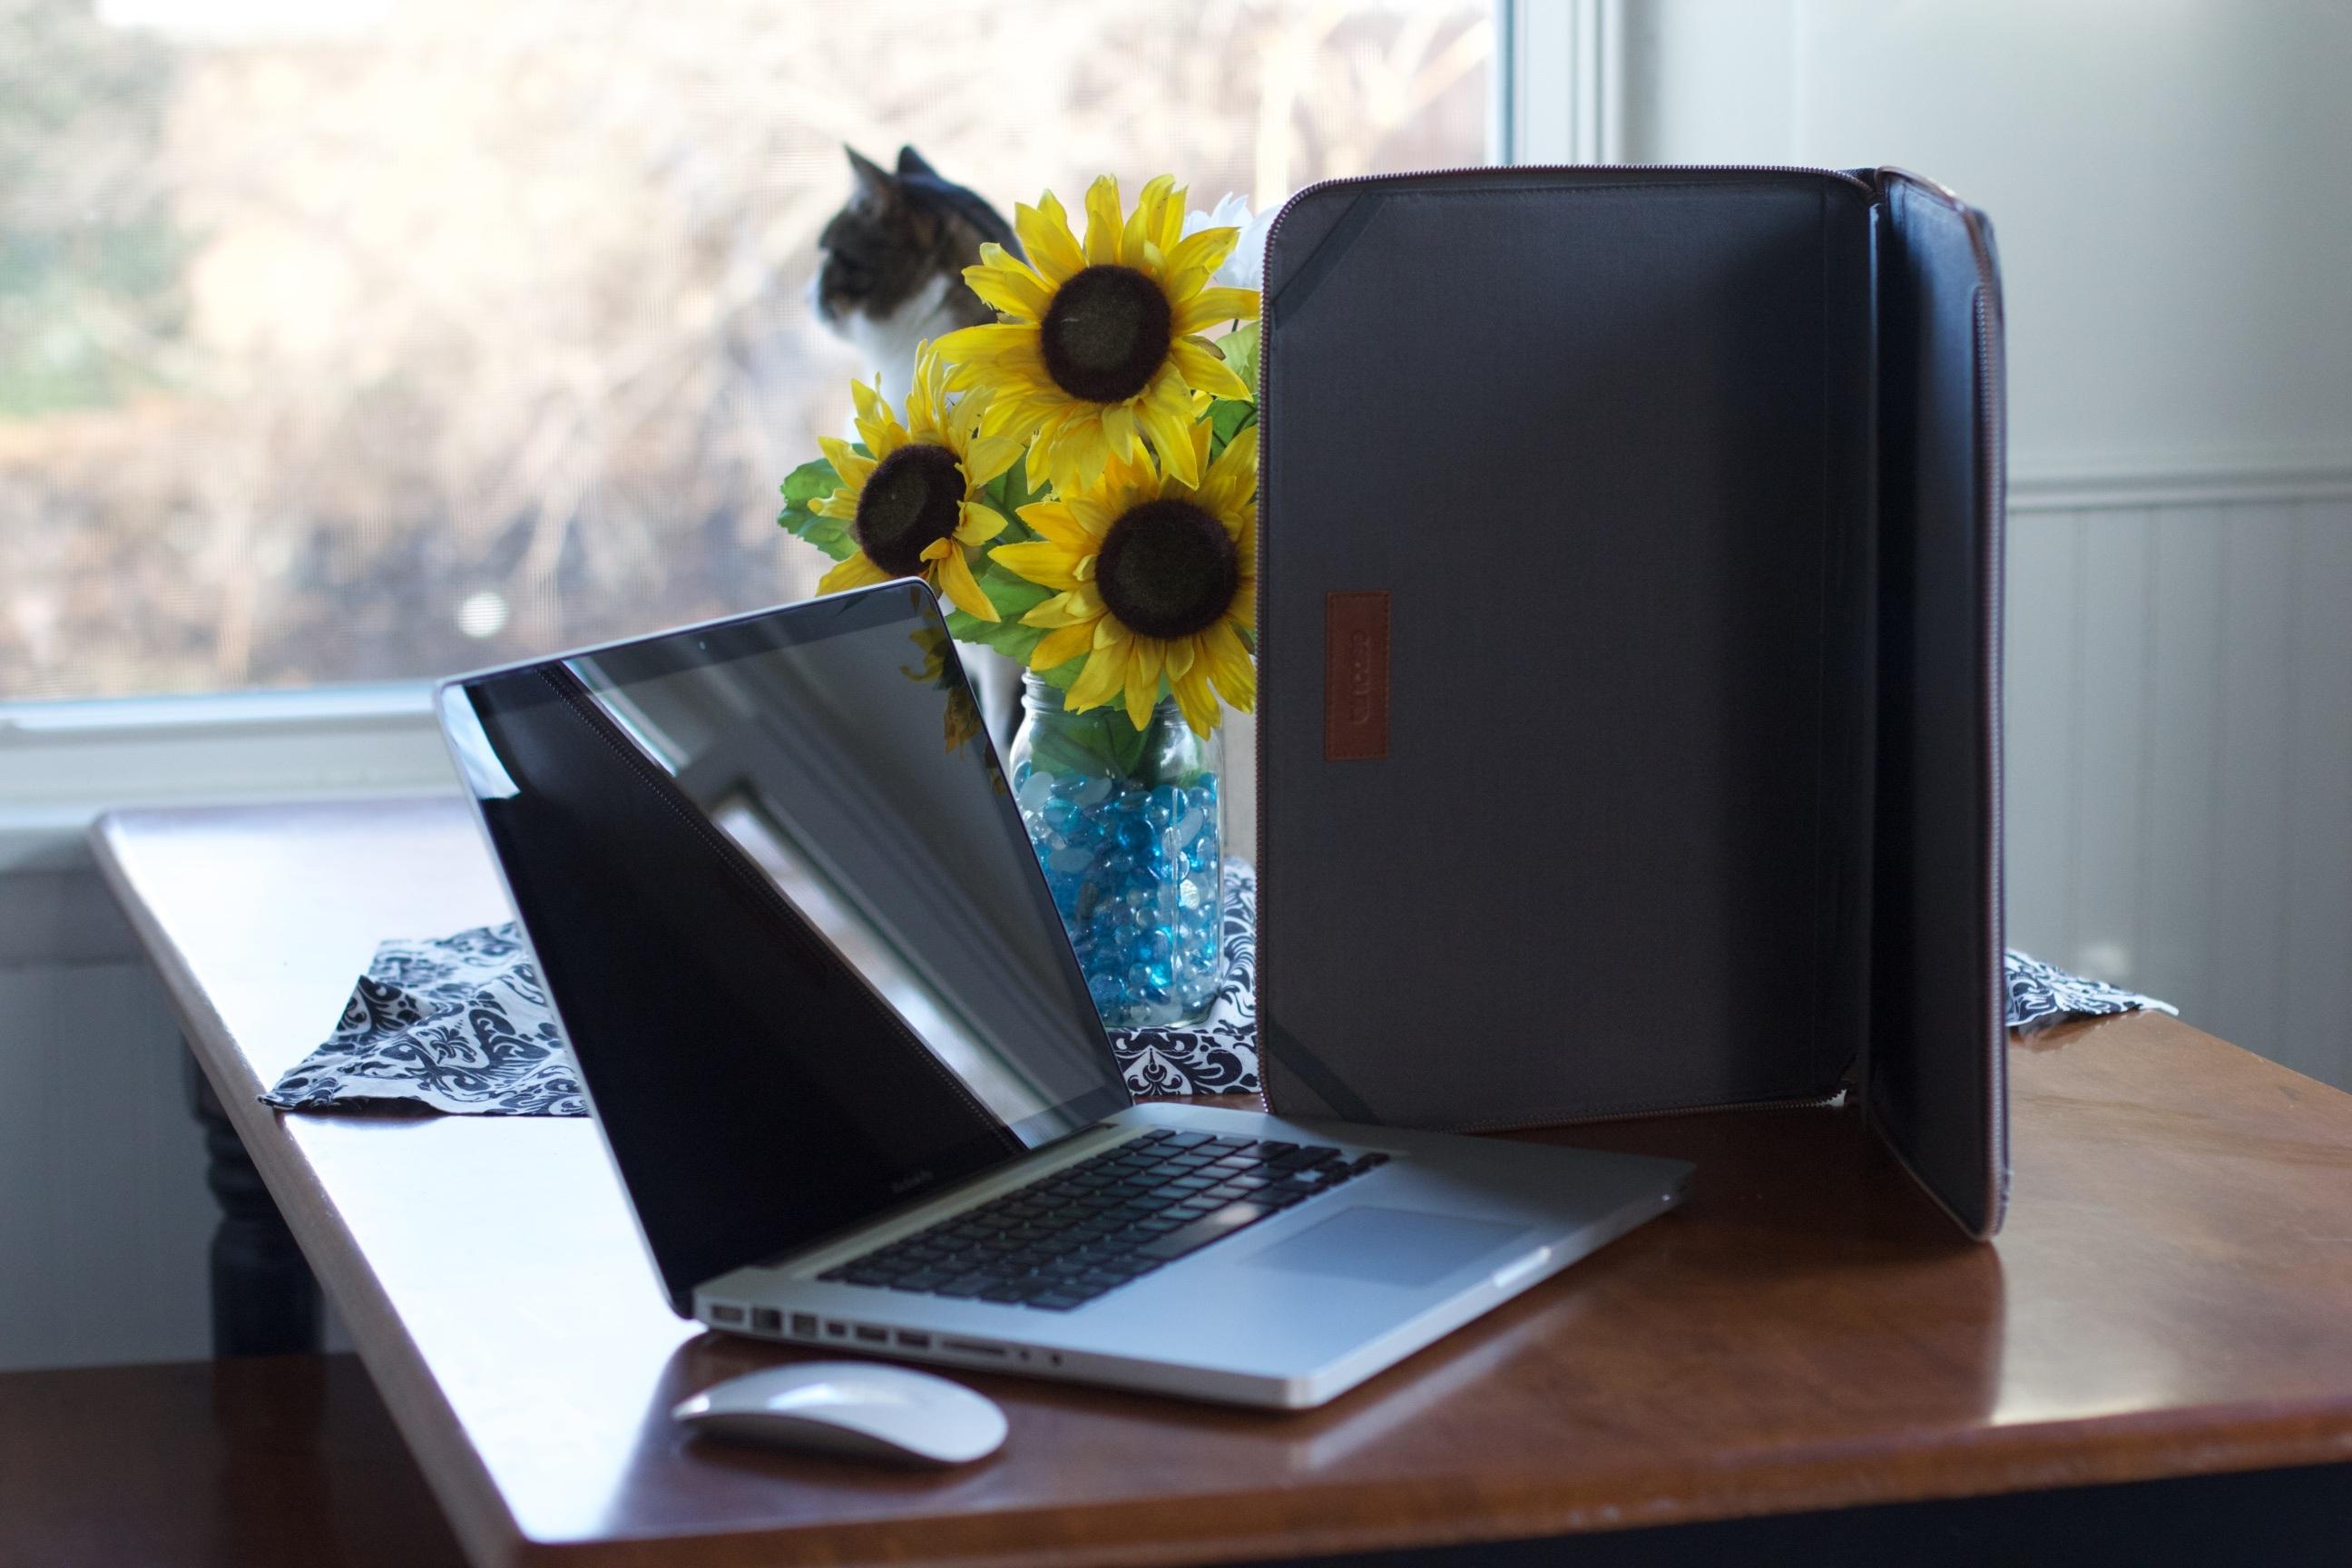 best website 011de ff061 Free Images : laptop, mac, apple, table, technology, flower, black ...